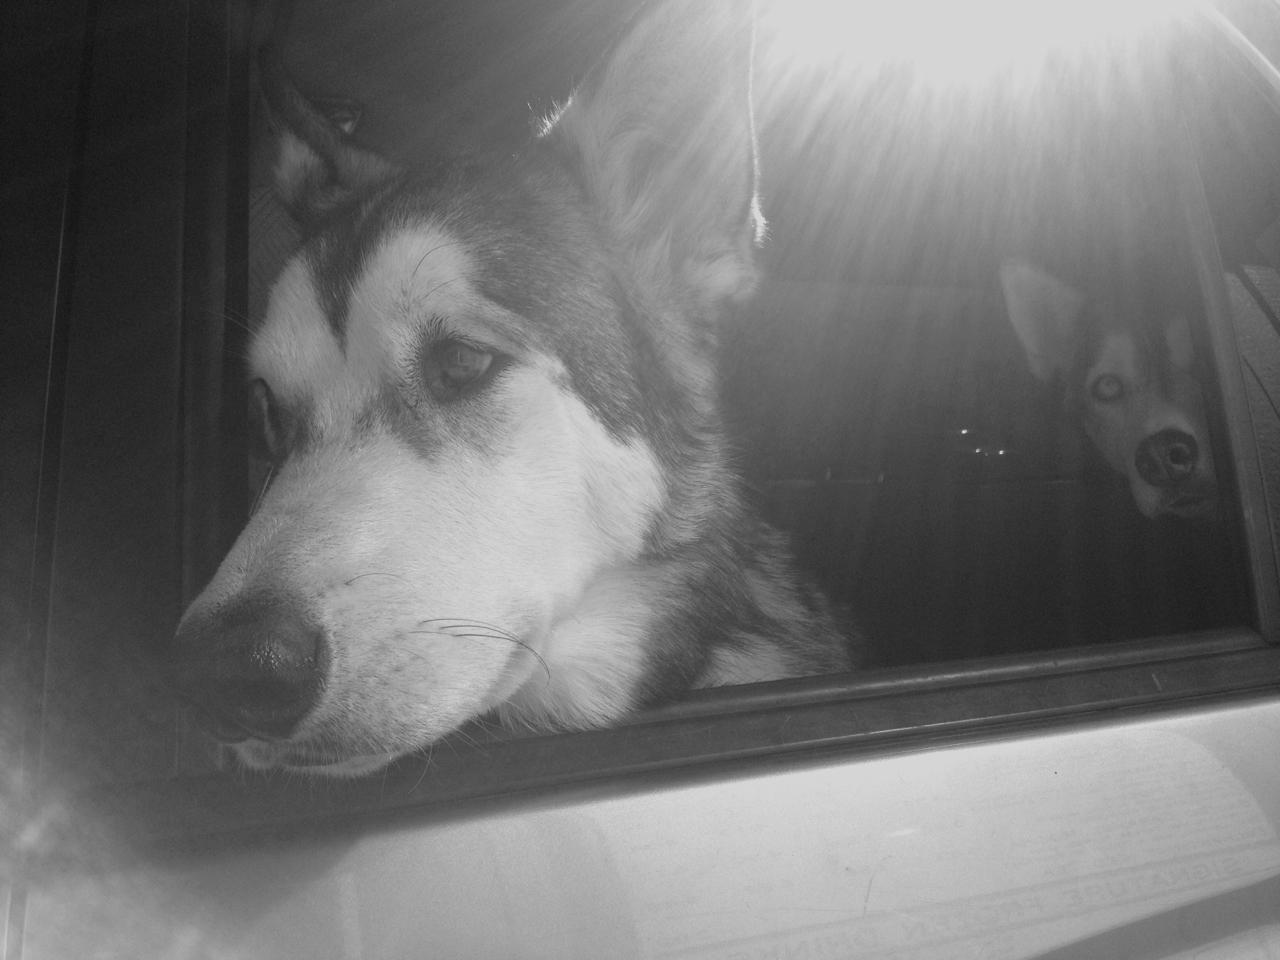 Ludo with kieska peeking through.